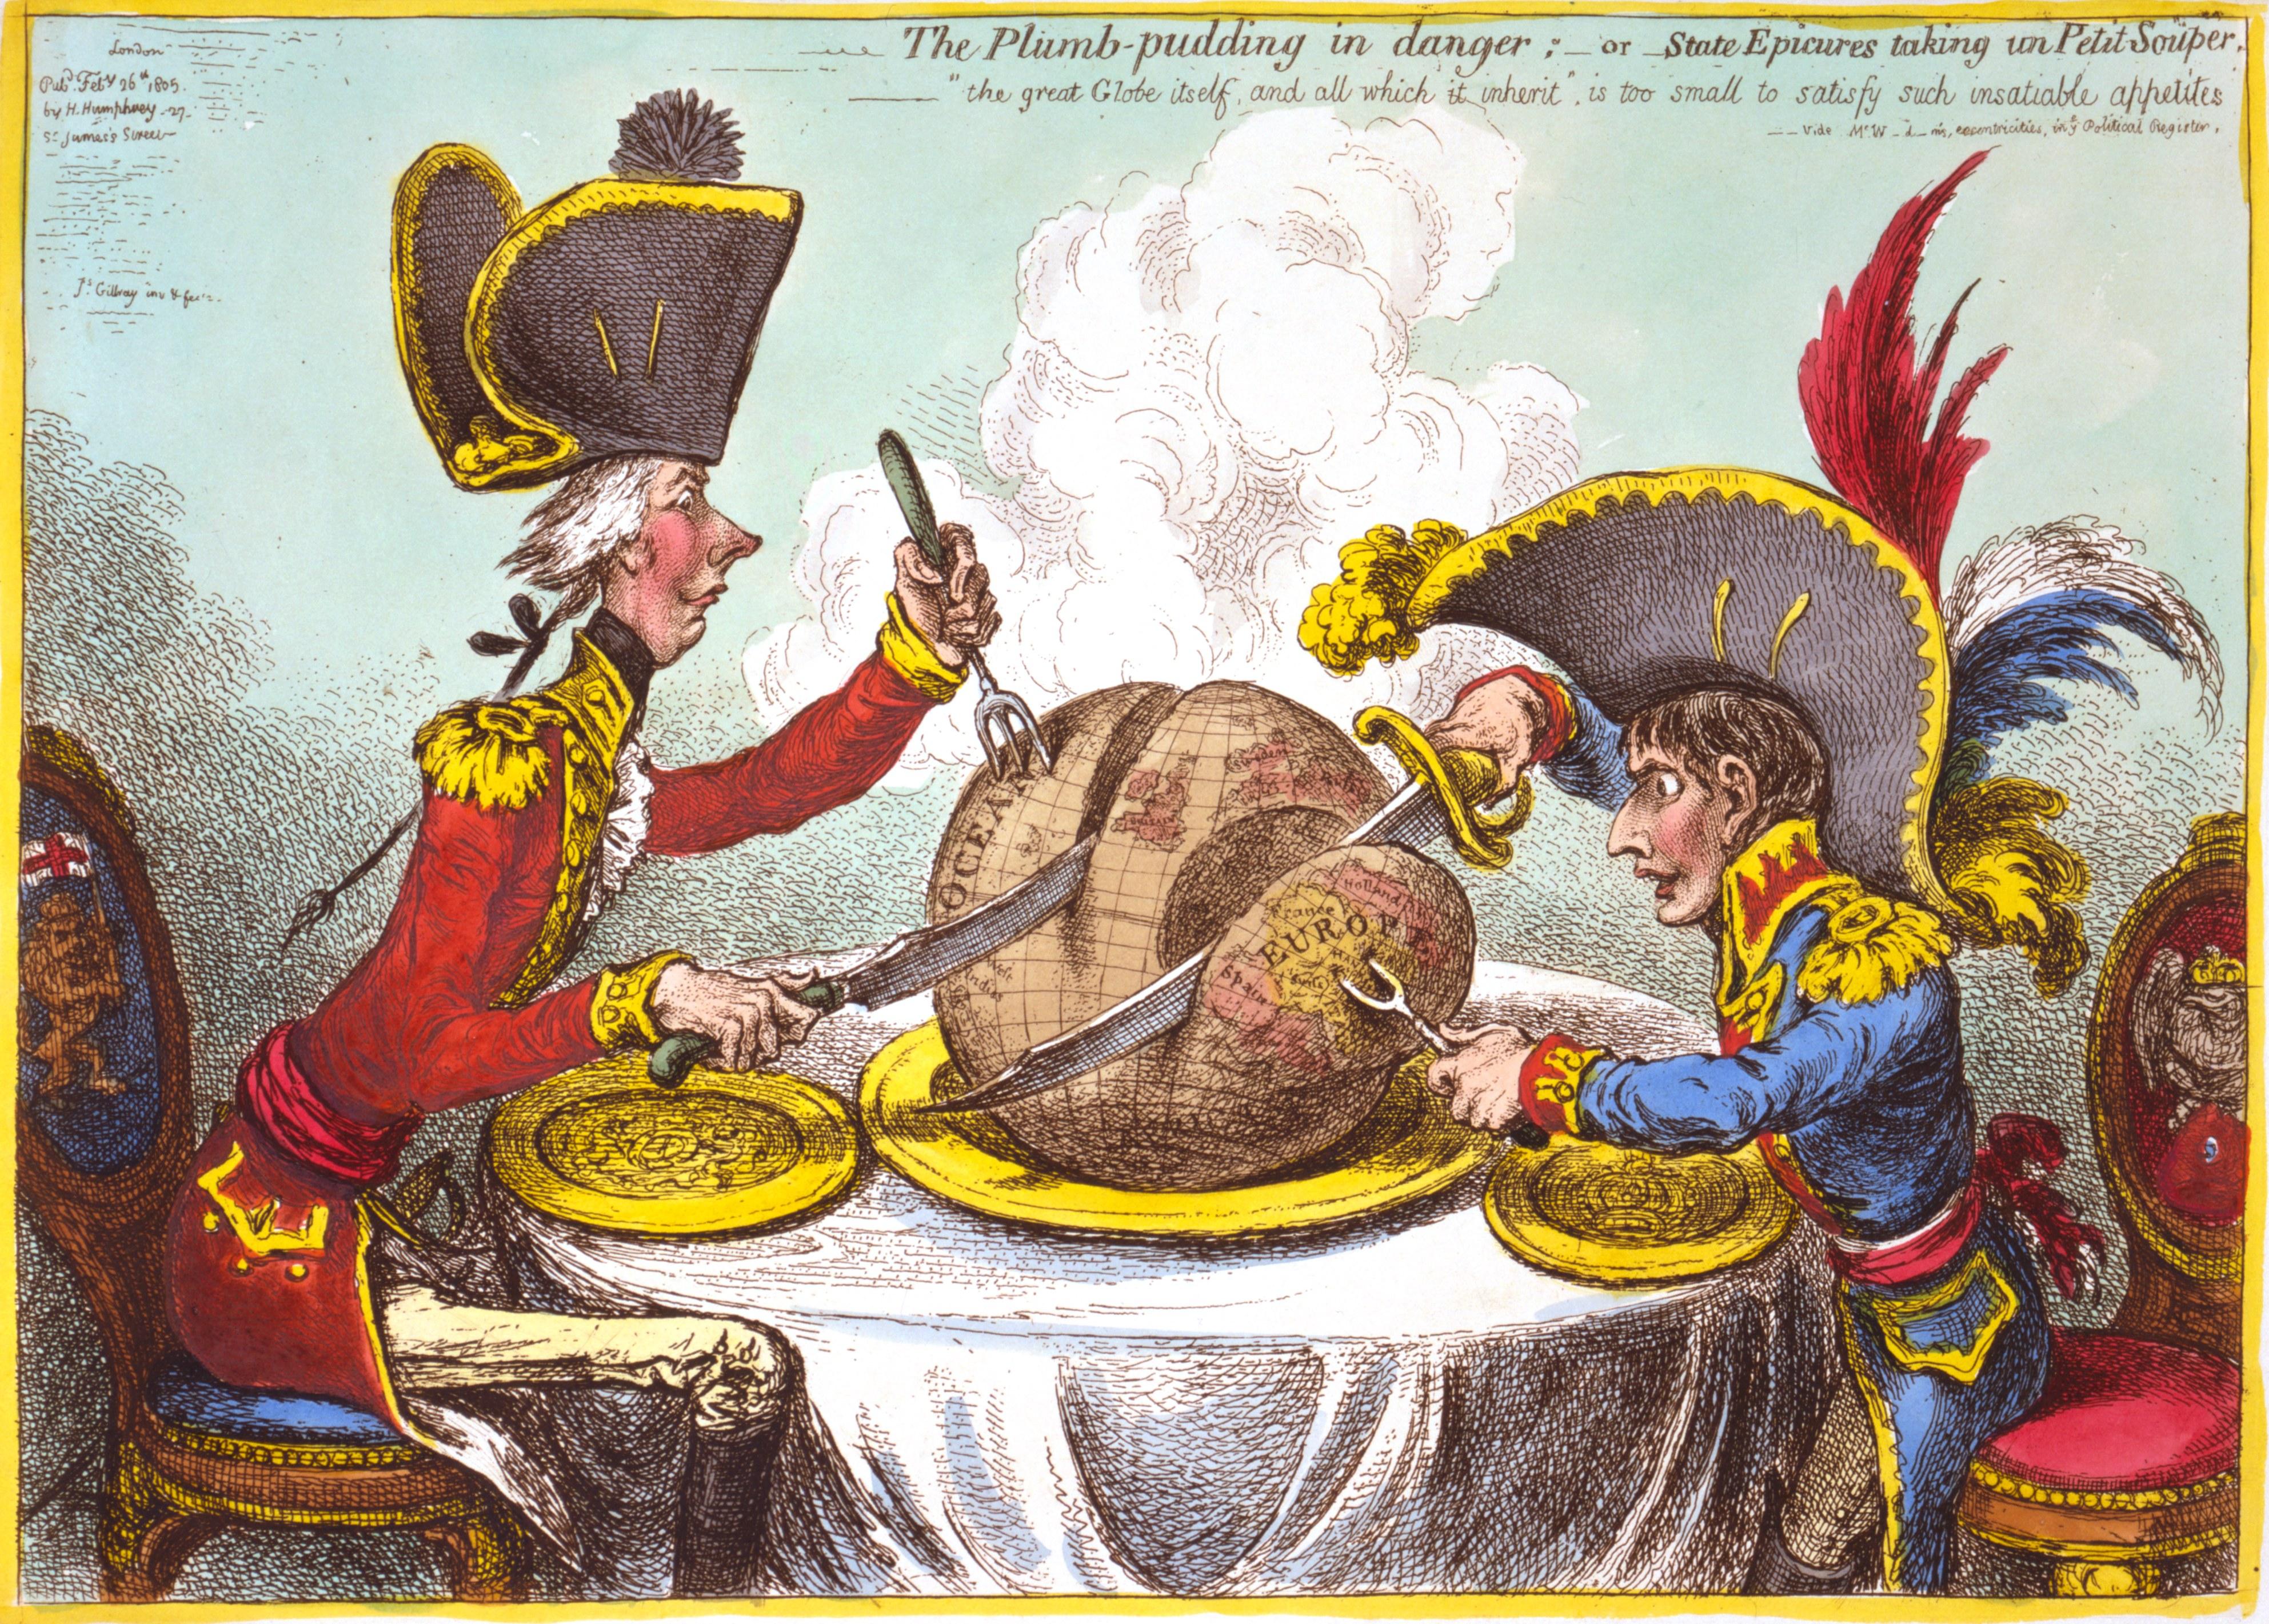 James Gillray, The Plumb-pudding in danger